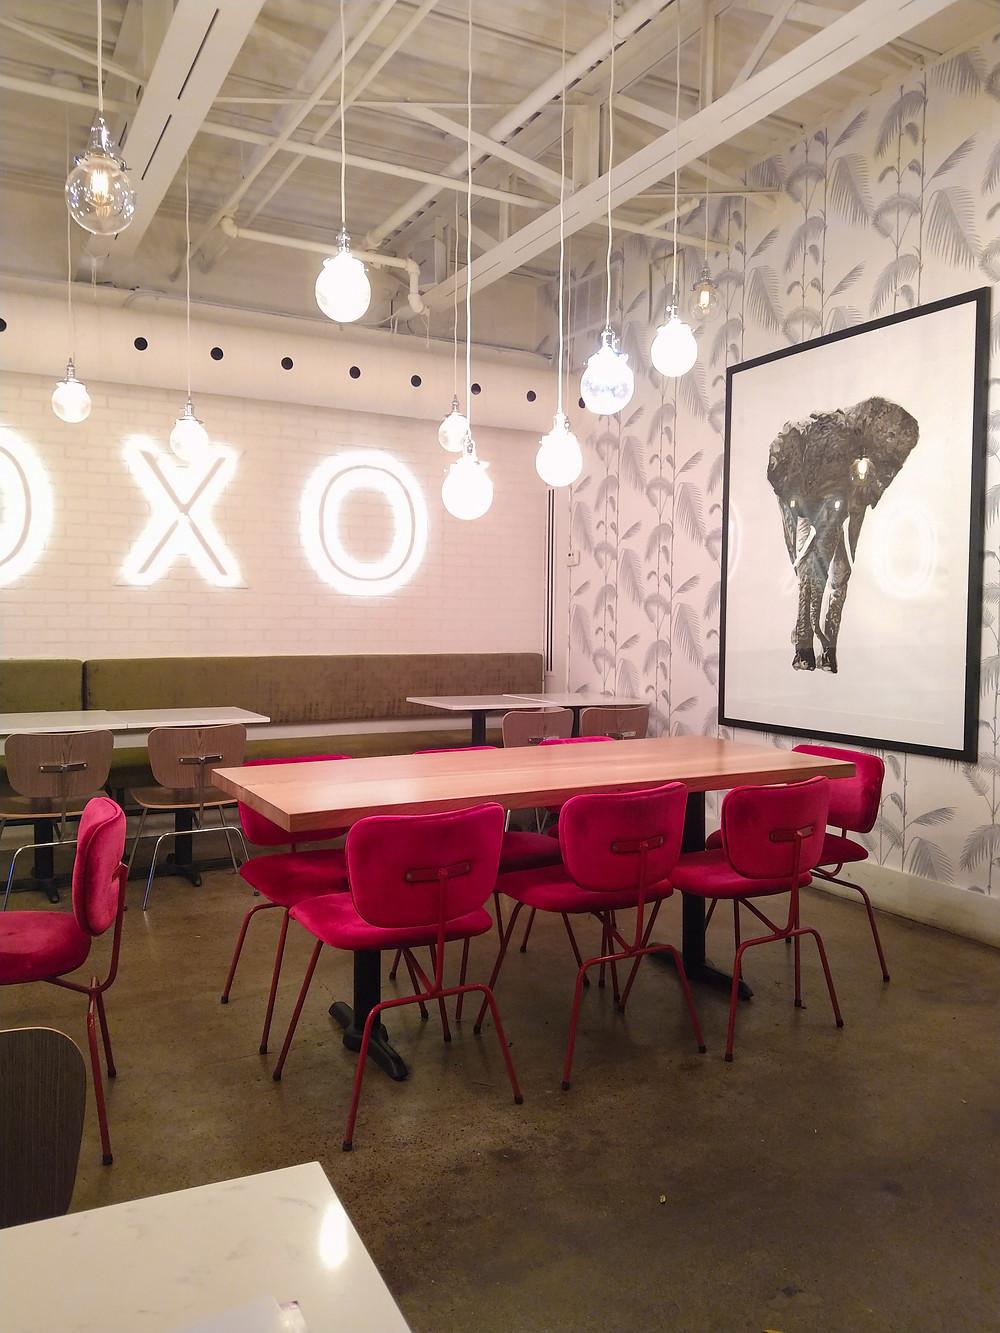 decor of a pink restaurant